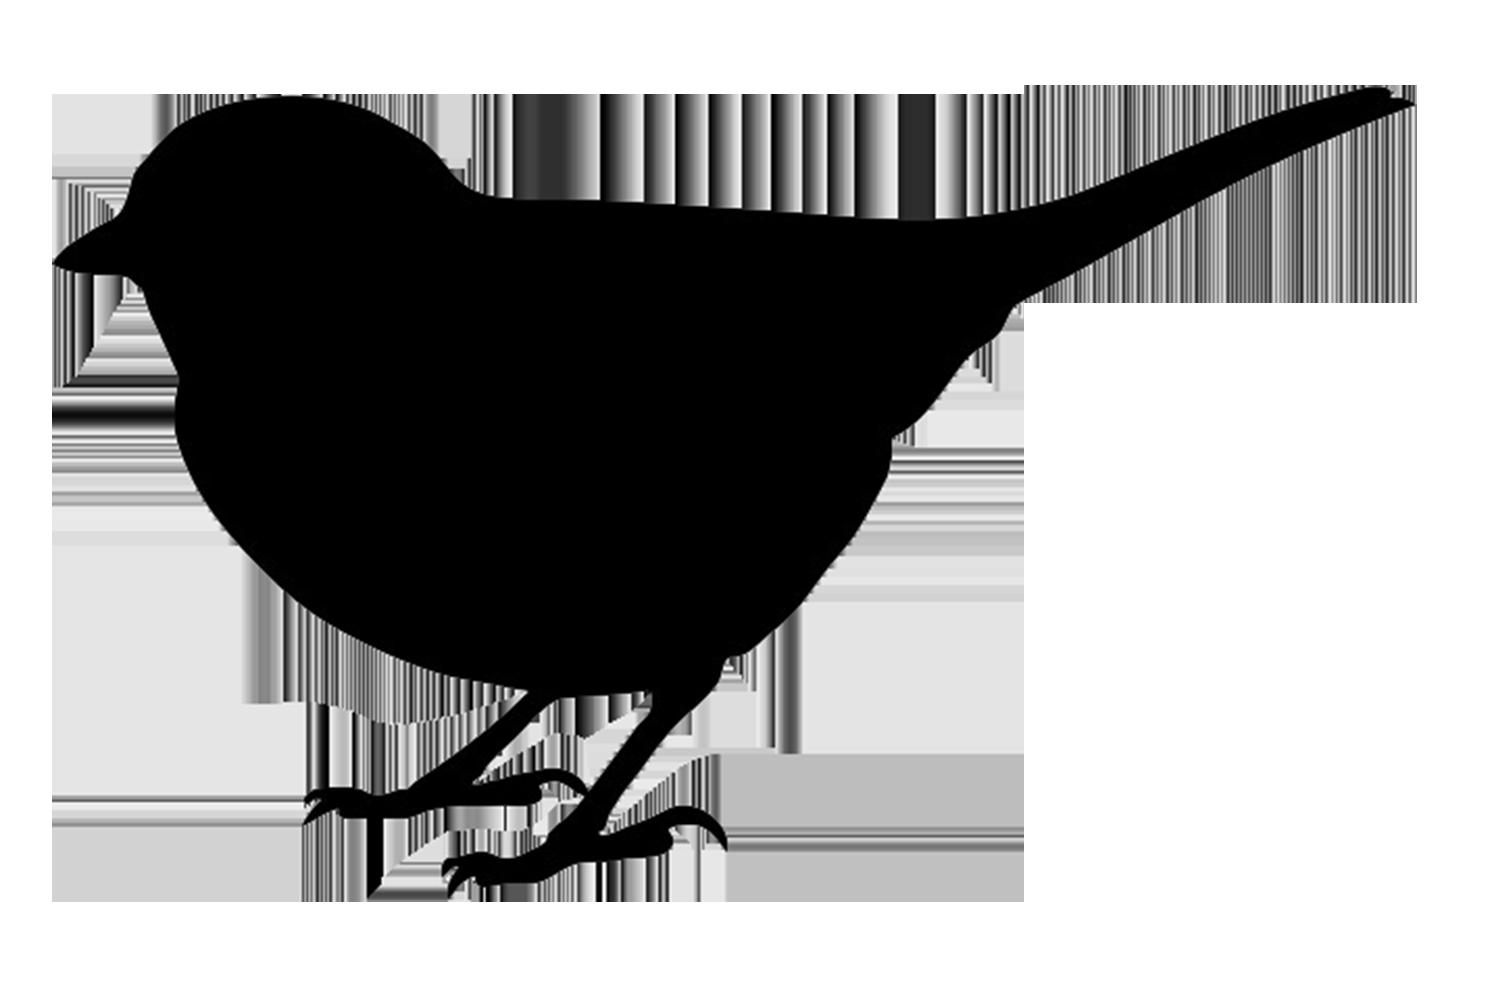 small bird black silhouette